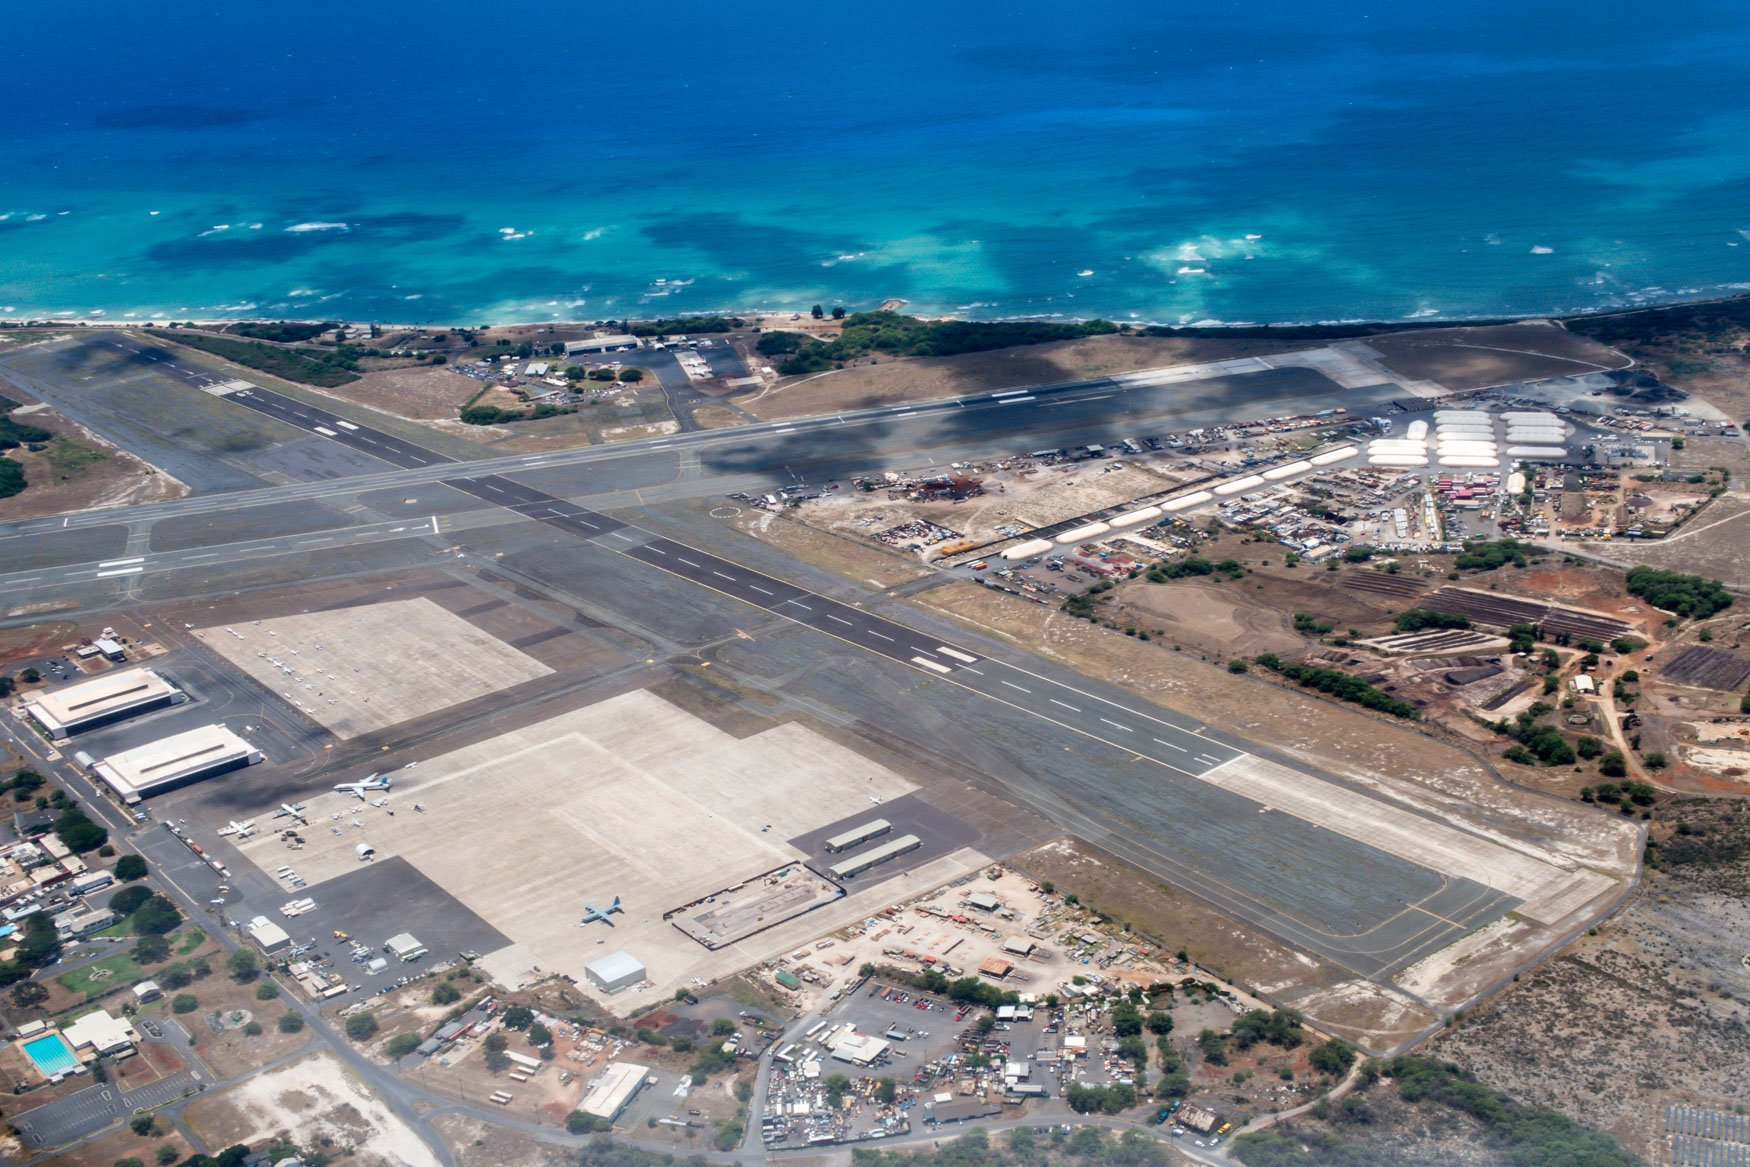 Kalaeloa Airport